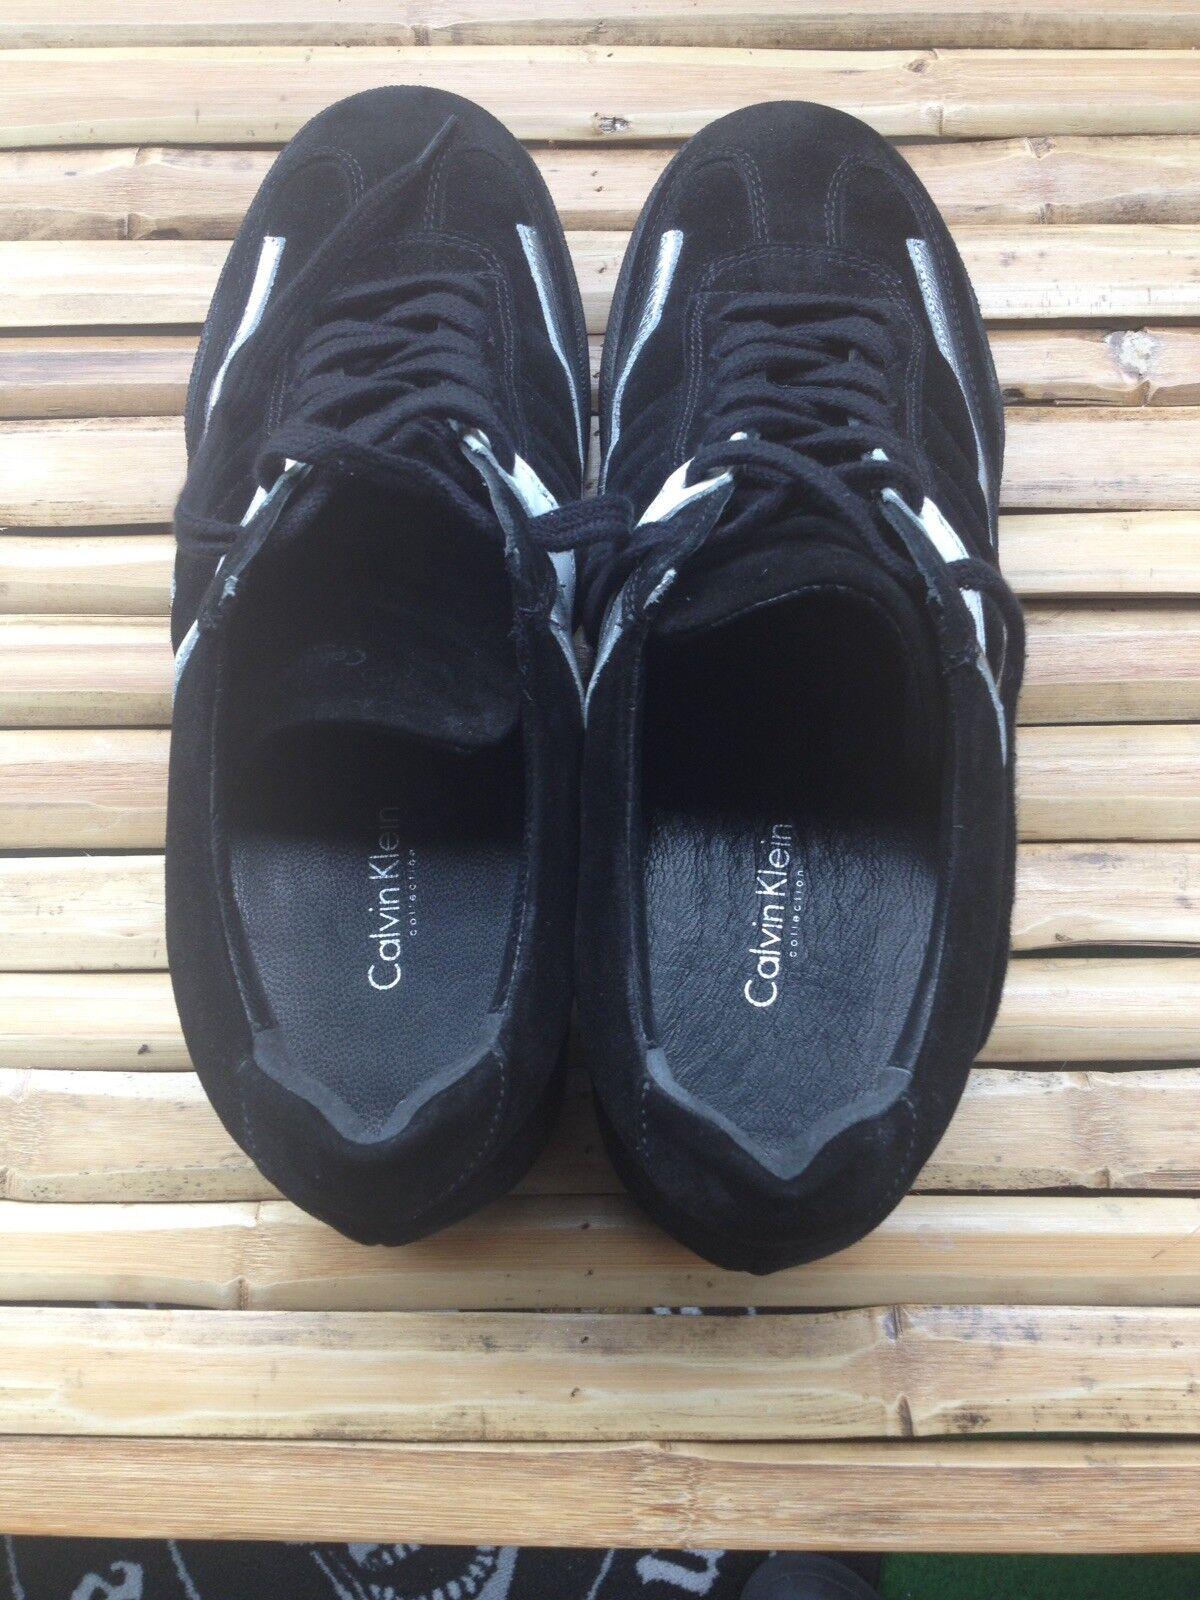 buy online c1077 e1c1d ... Nike Air Huarache Run Ultra Black White 833147-003 Mens Mens Mens Size  9 Brand ...